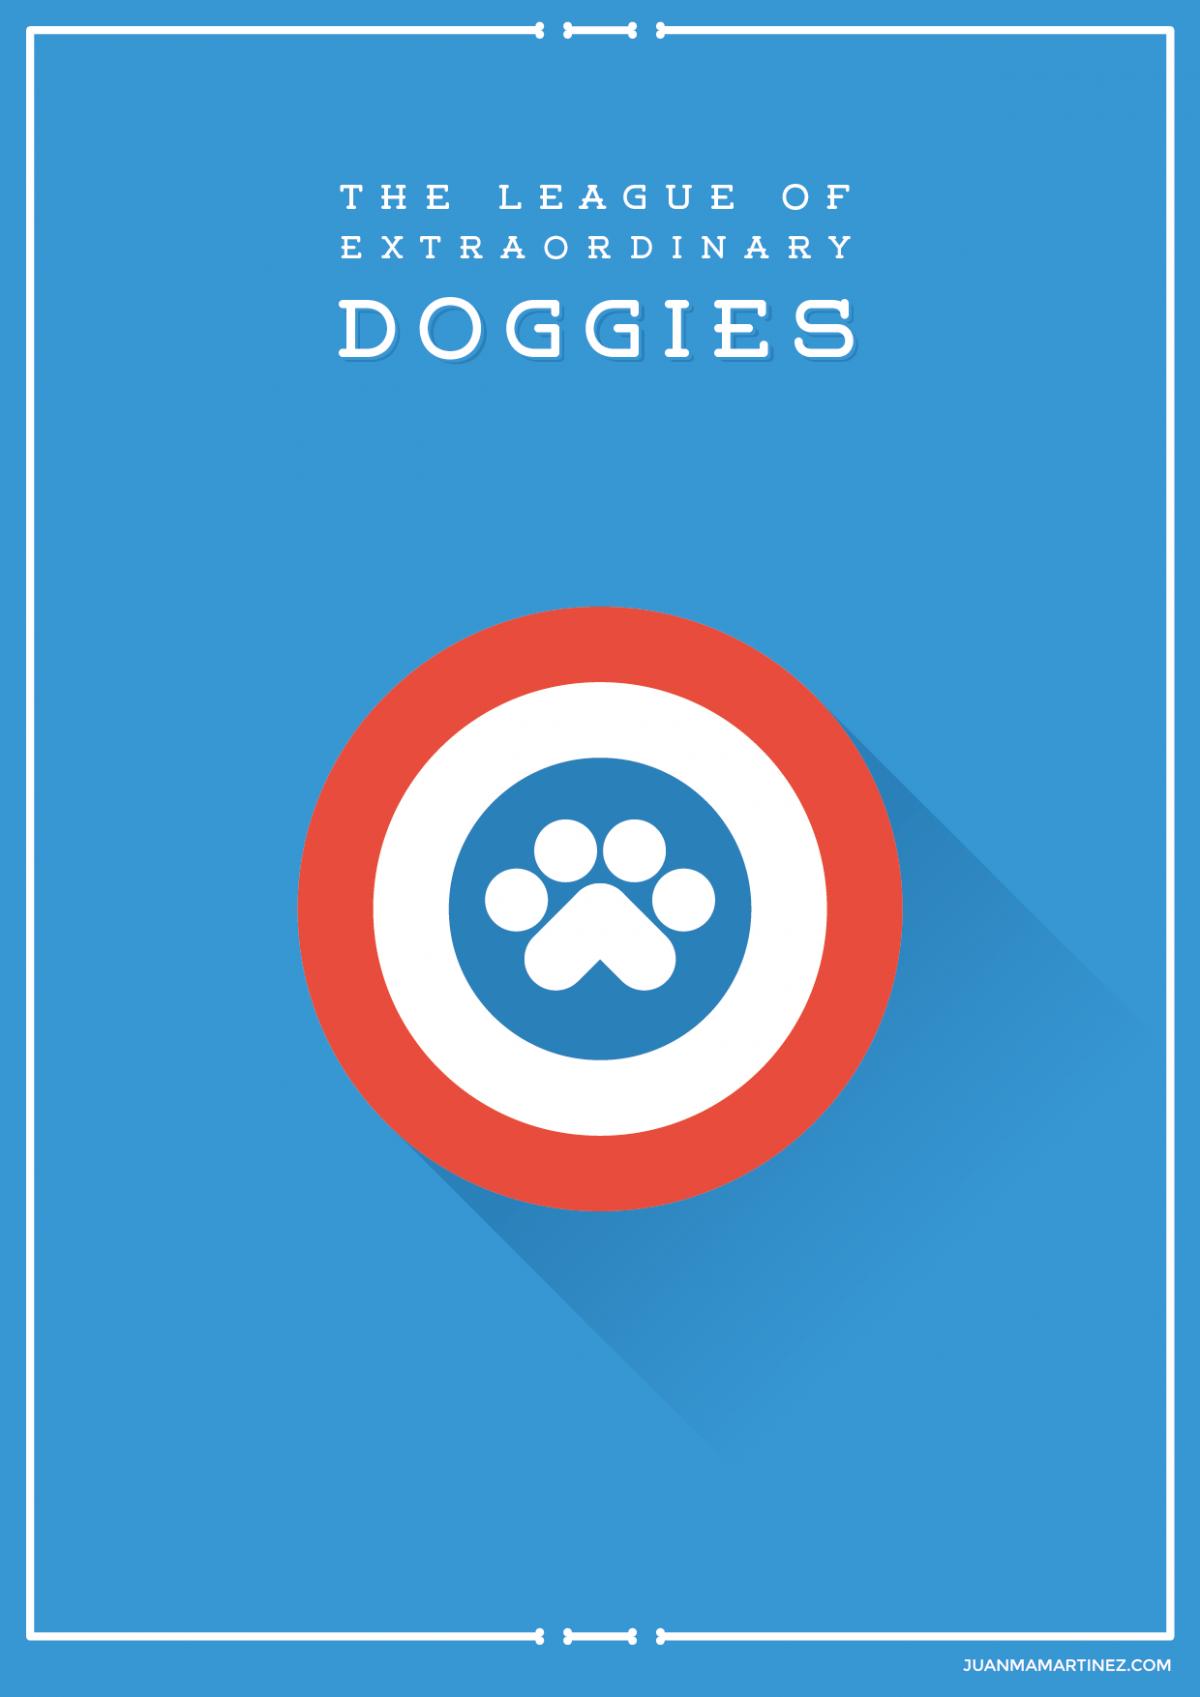 extraordinary-doggies-illustration